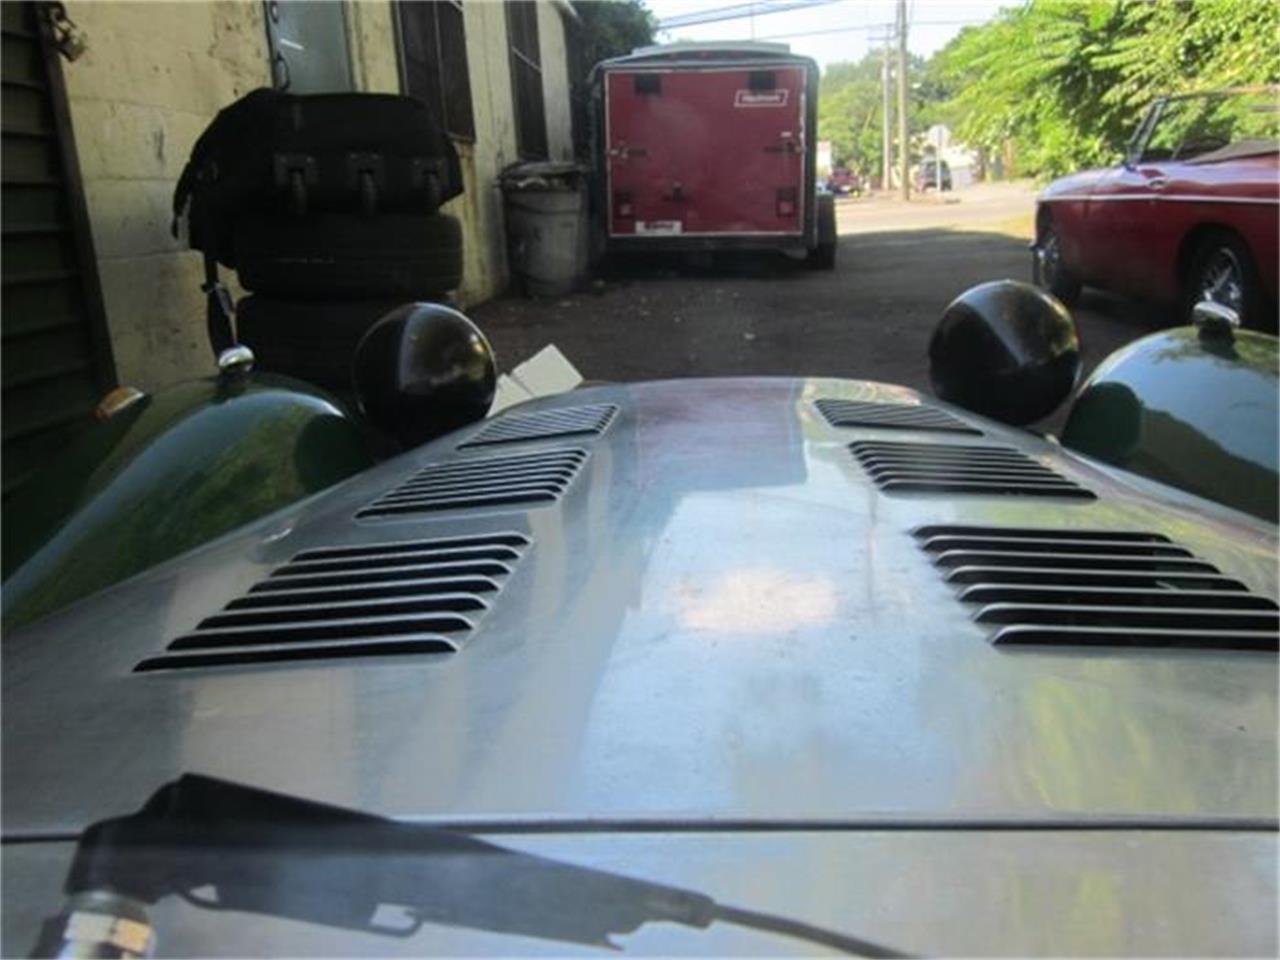 Large Picture of '84 Lotus Caterham Super 7 located in Stratford Connecticut - $36,000.00 - F2BT